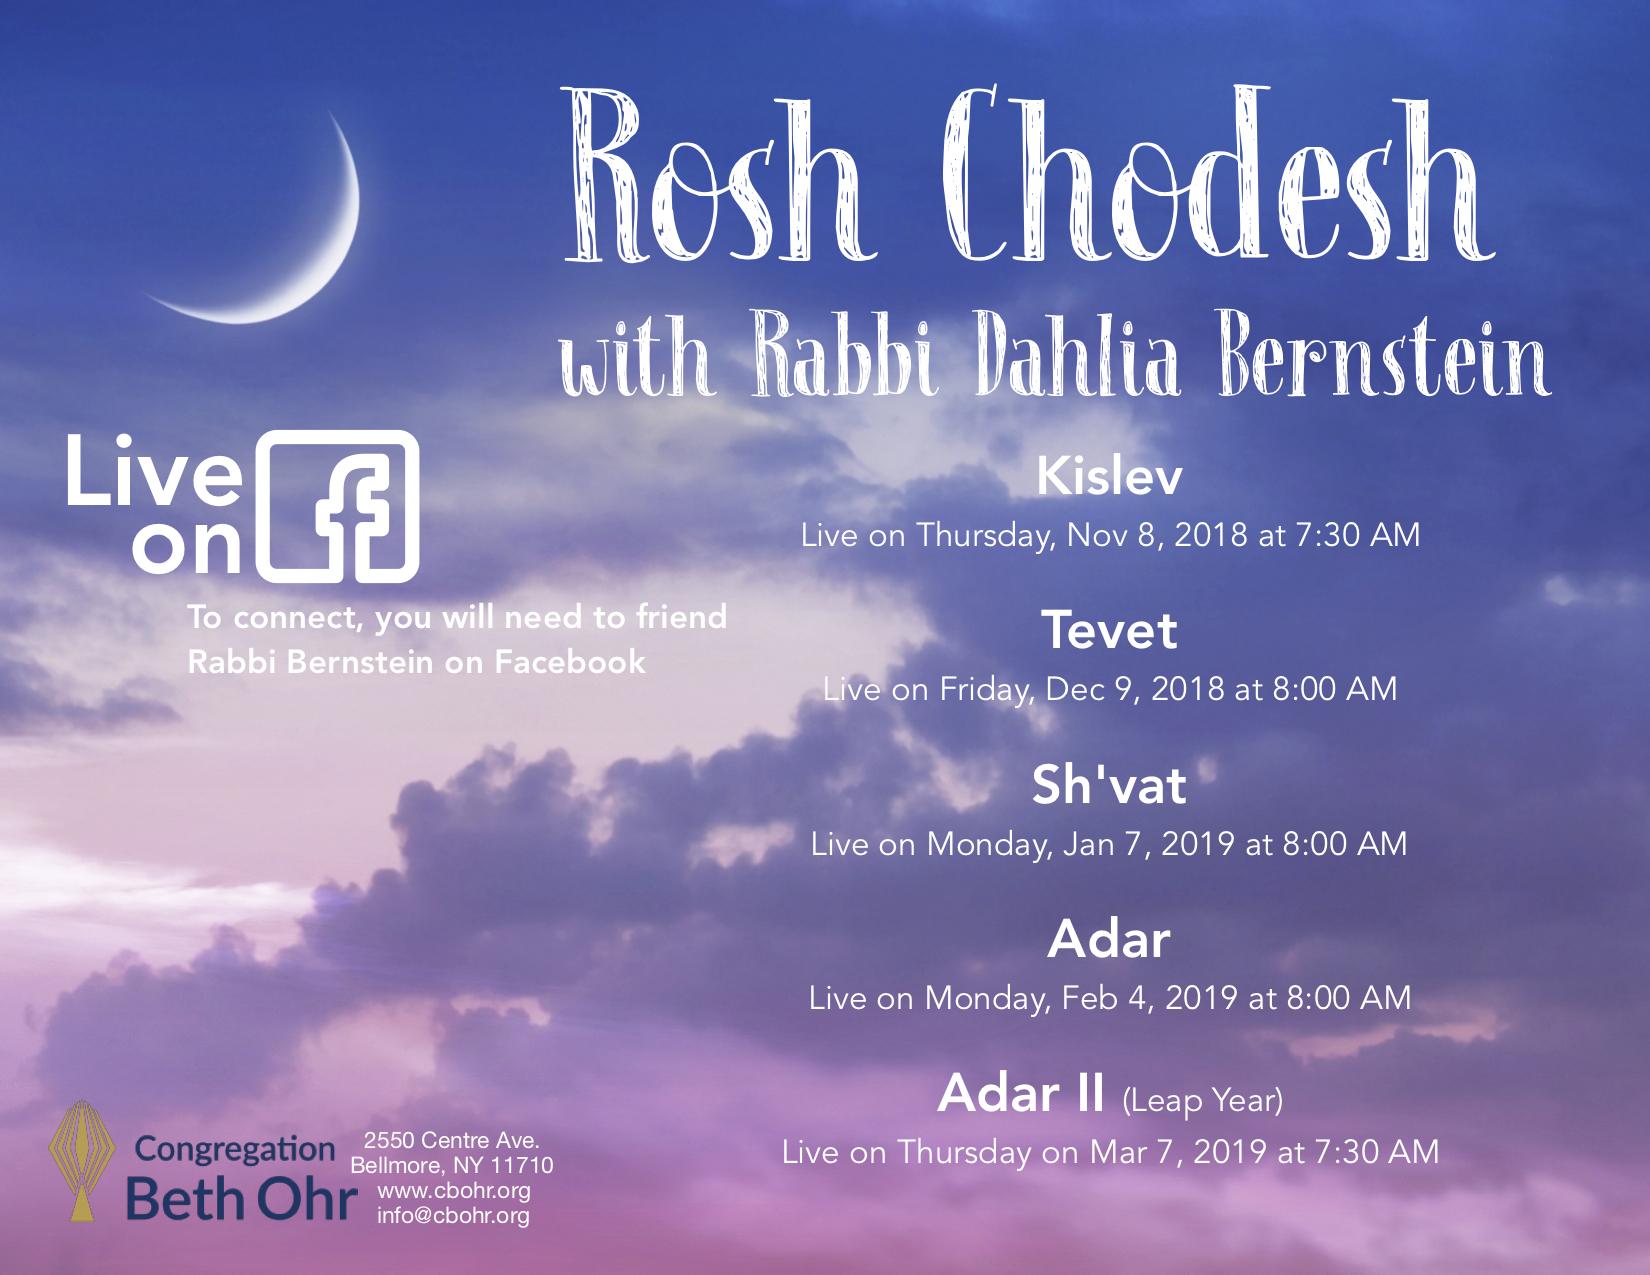 Rosh Chodesh Live